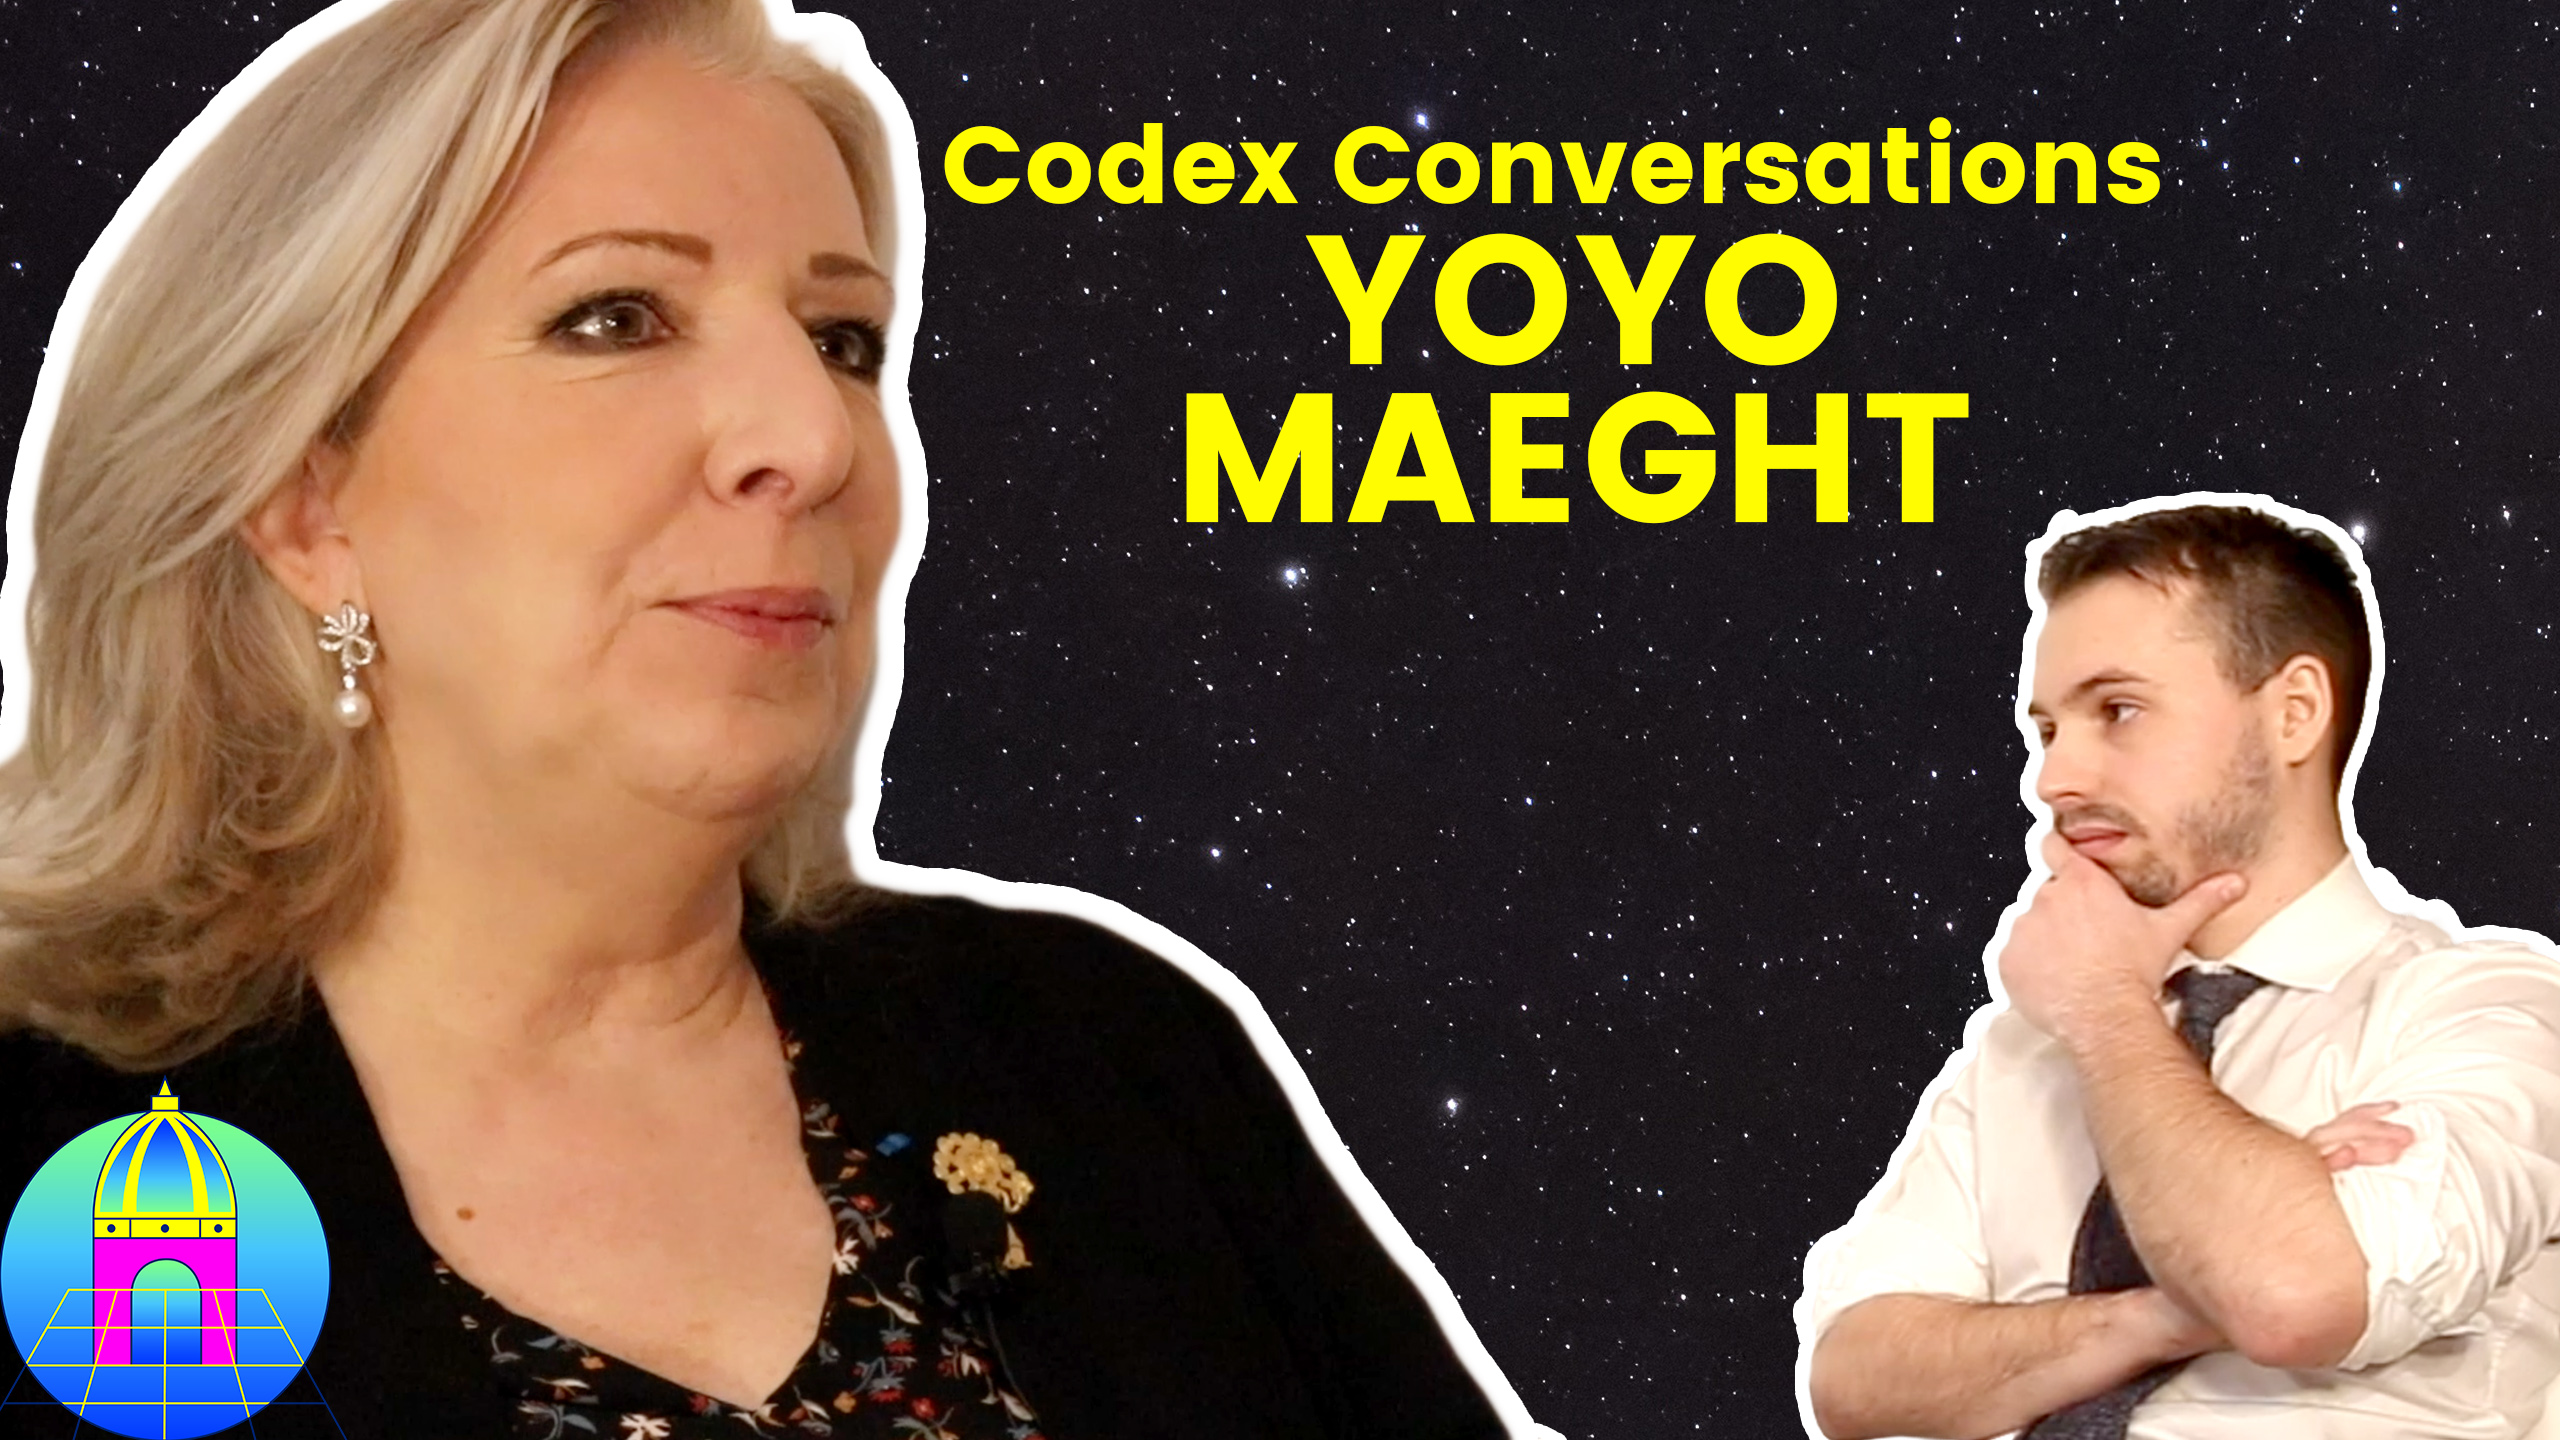 CODEX CONVERSATIONS 05 ✖️ YOYO MAEGHT